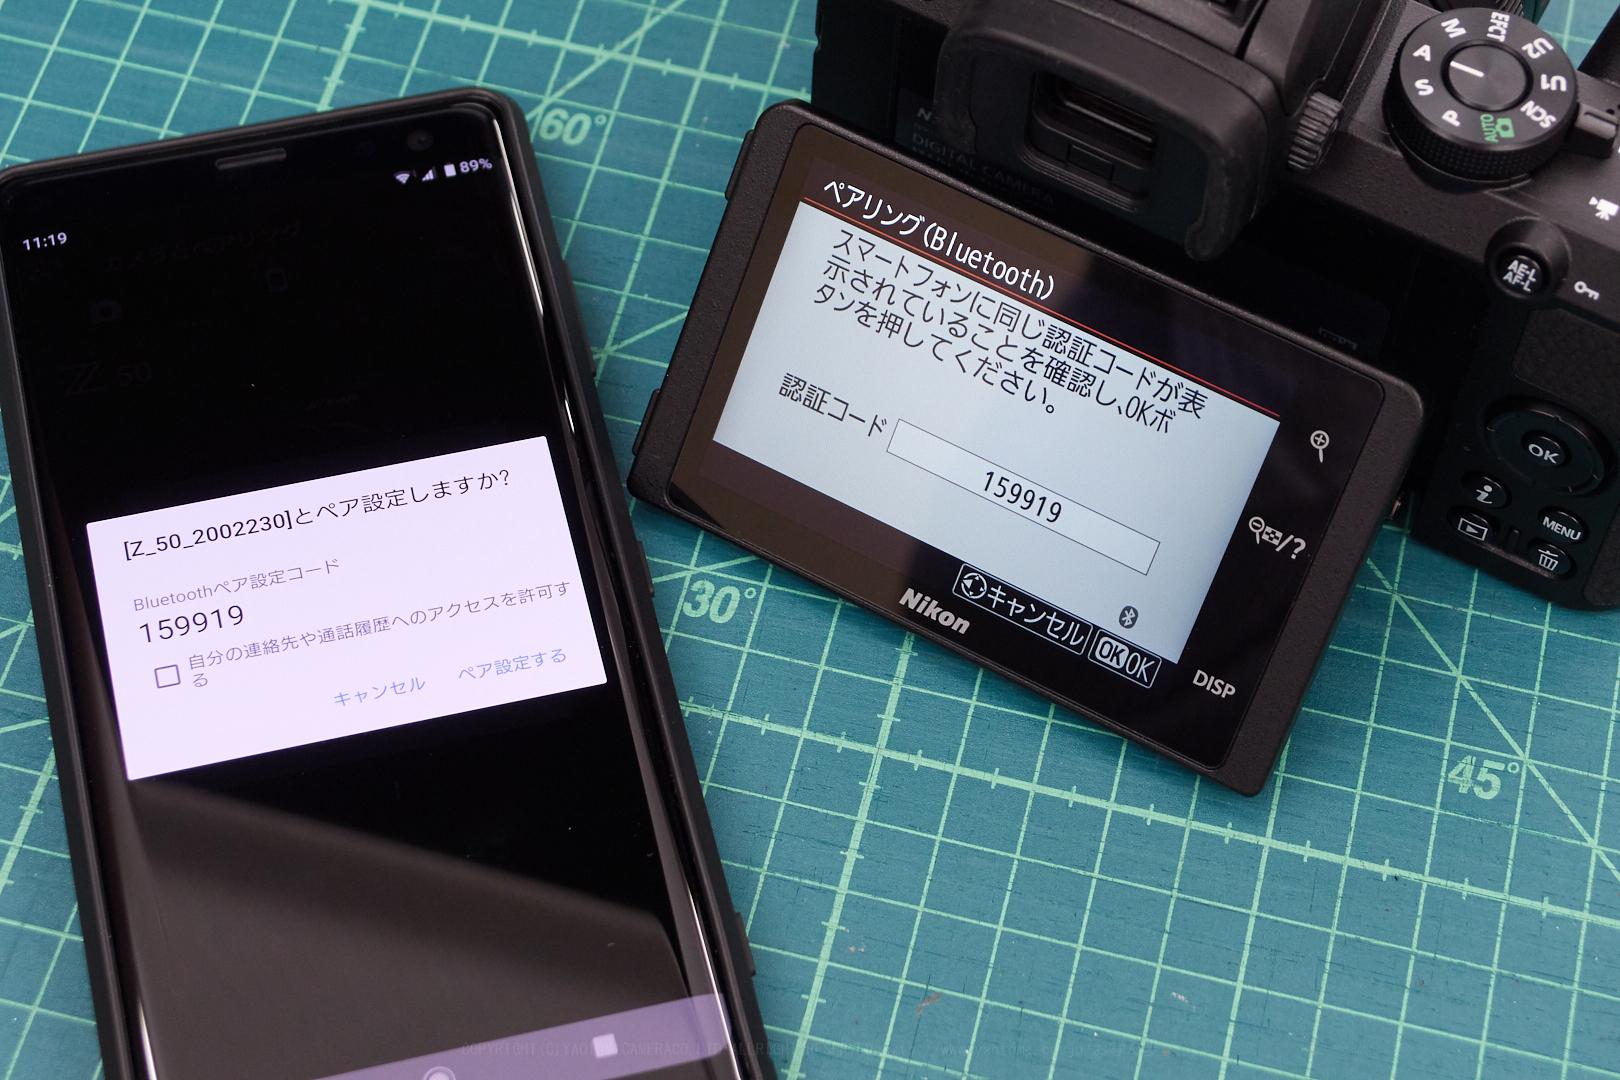 https://www.yaotomi.co.jp/blog/walk/Nikon50_17.jpg